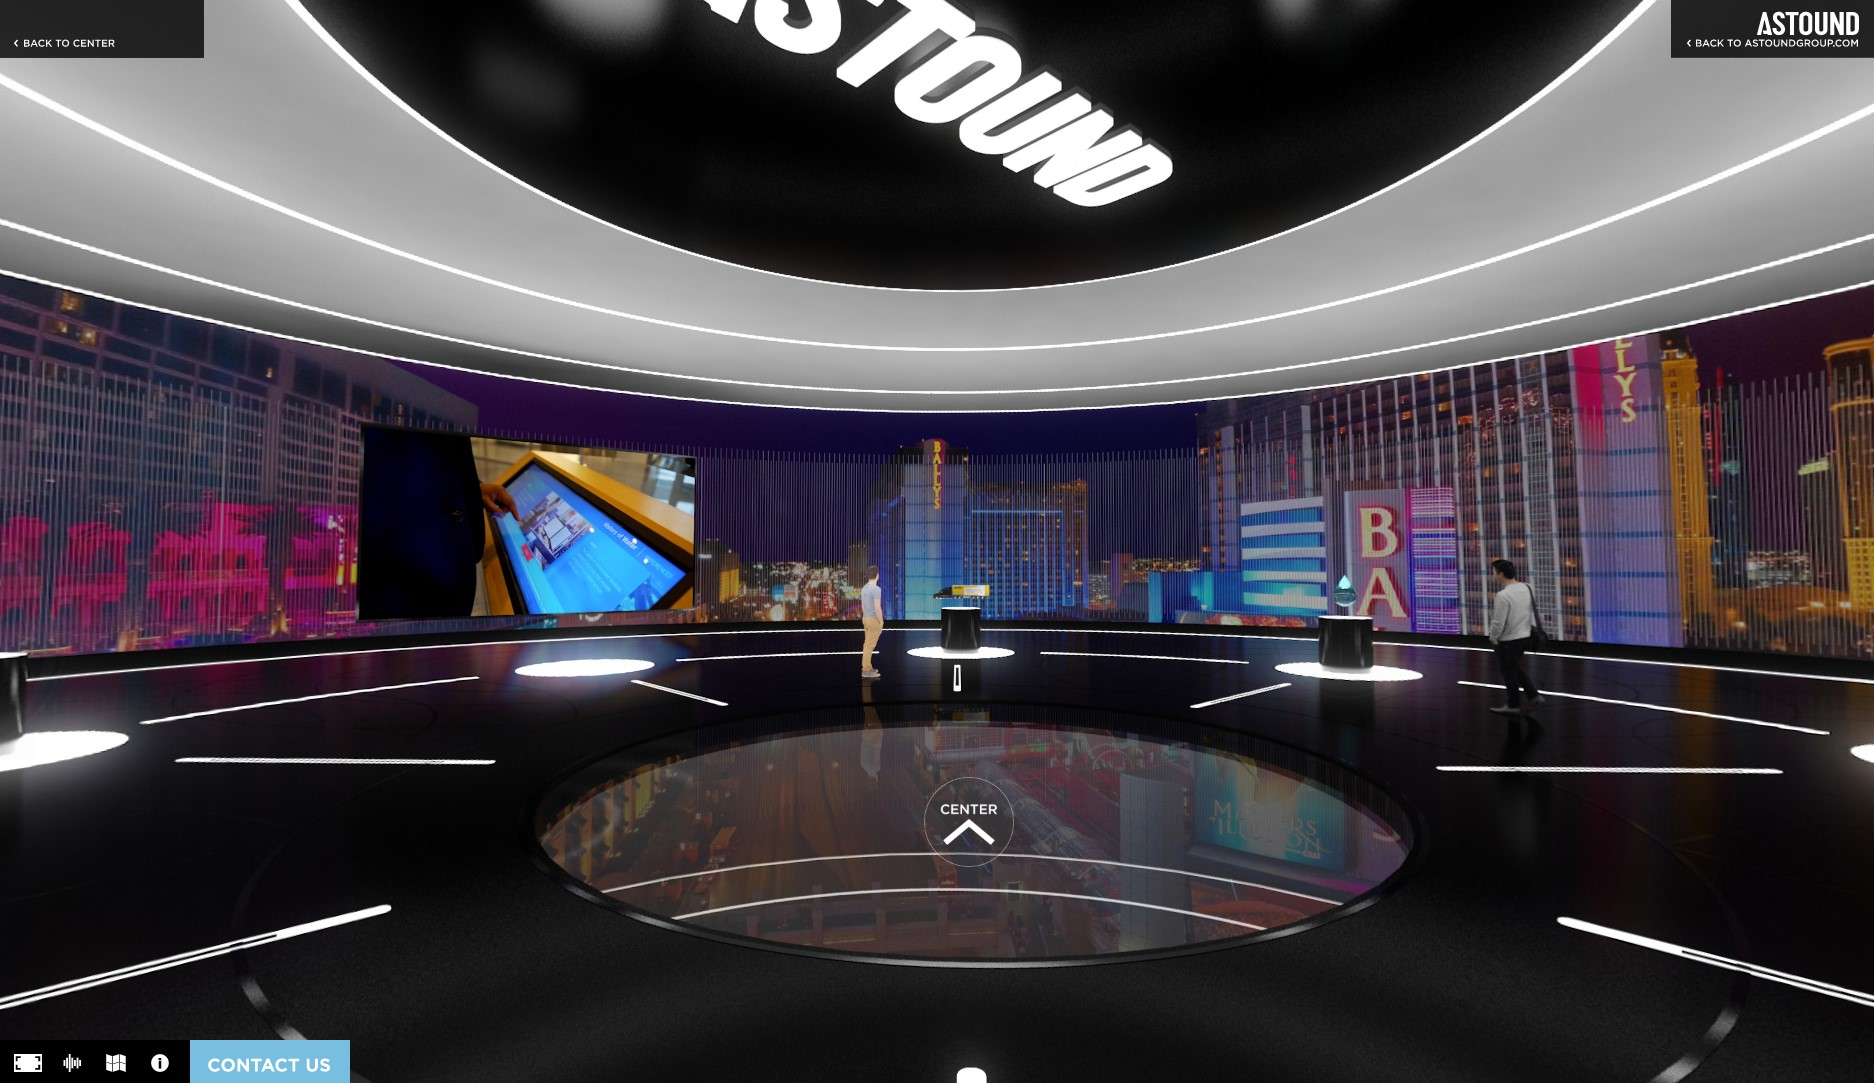 ASTOUND_digital_theater